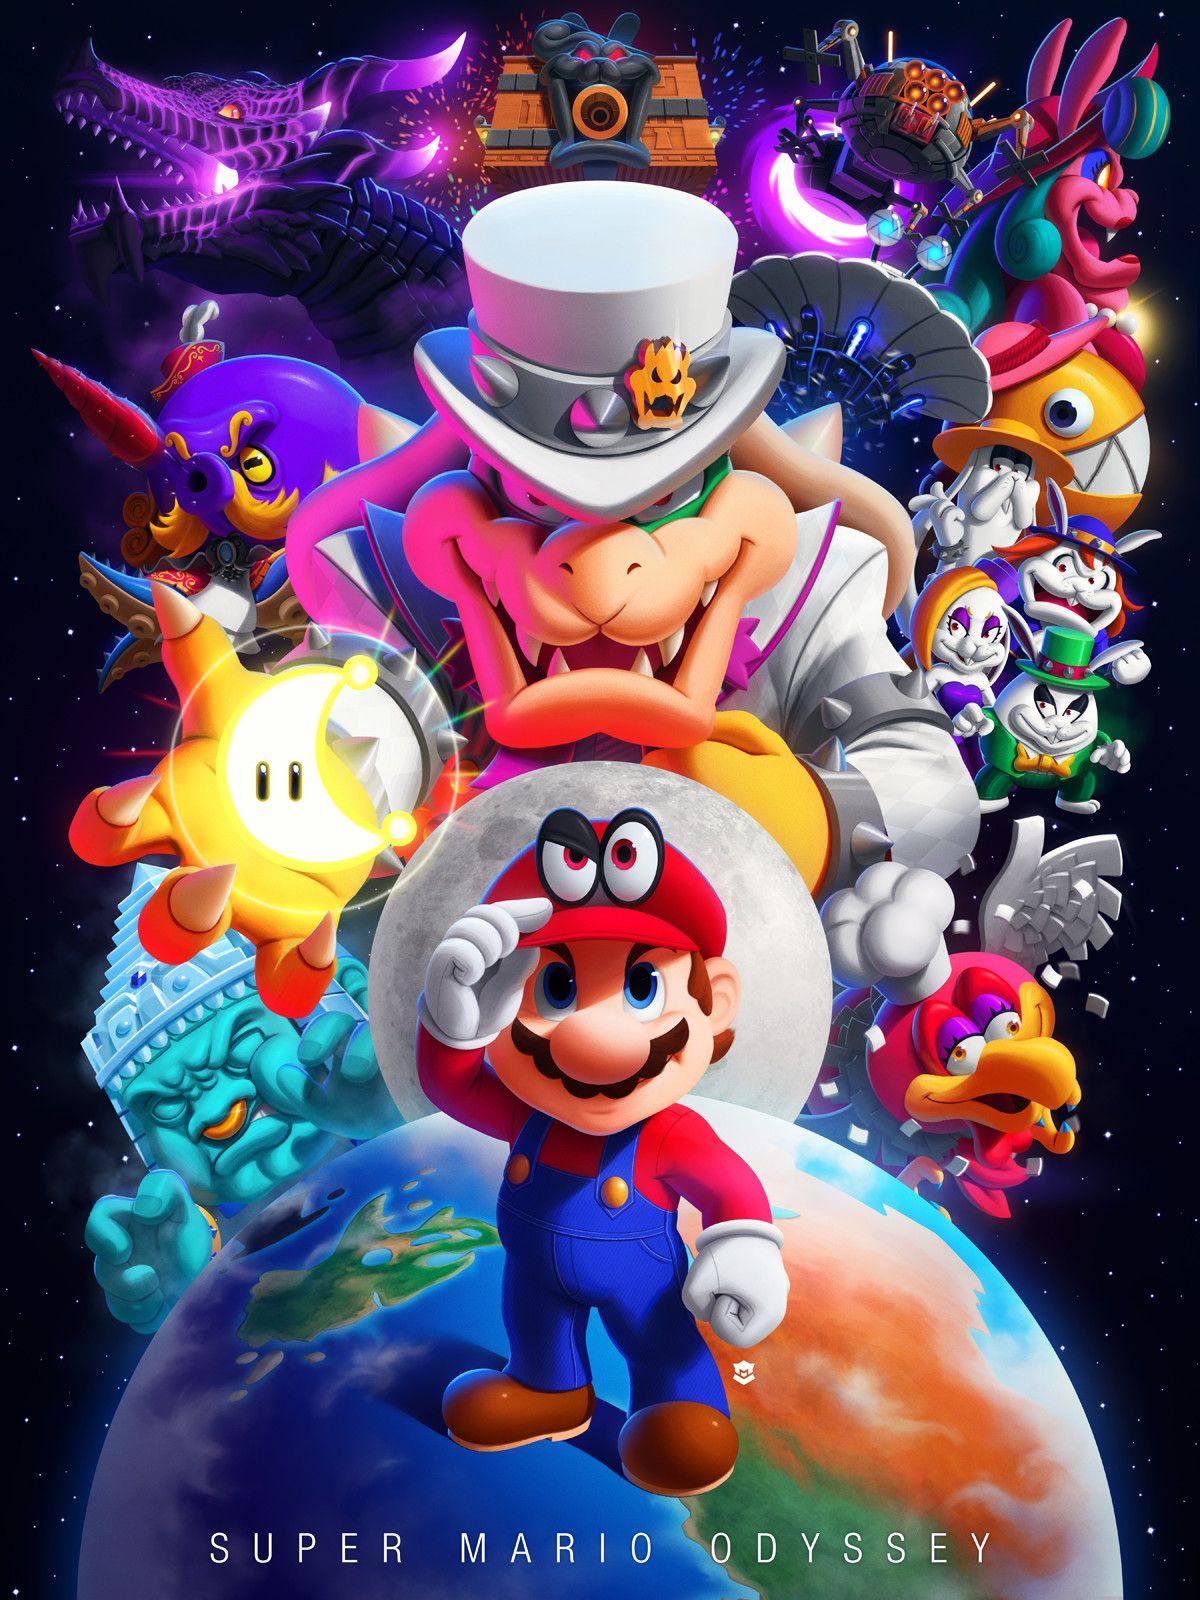 Super Mario Odyssey! | Super mario's world | Mario kart, Super mario